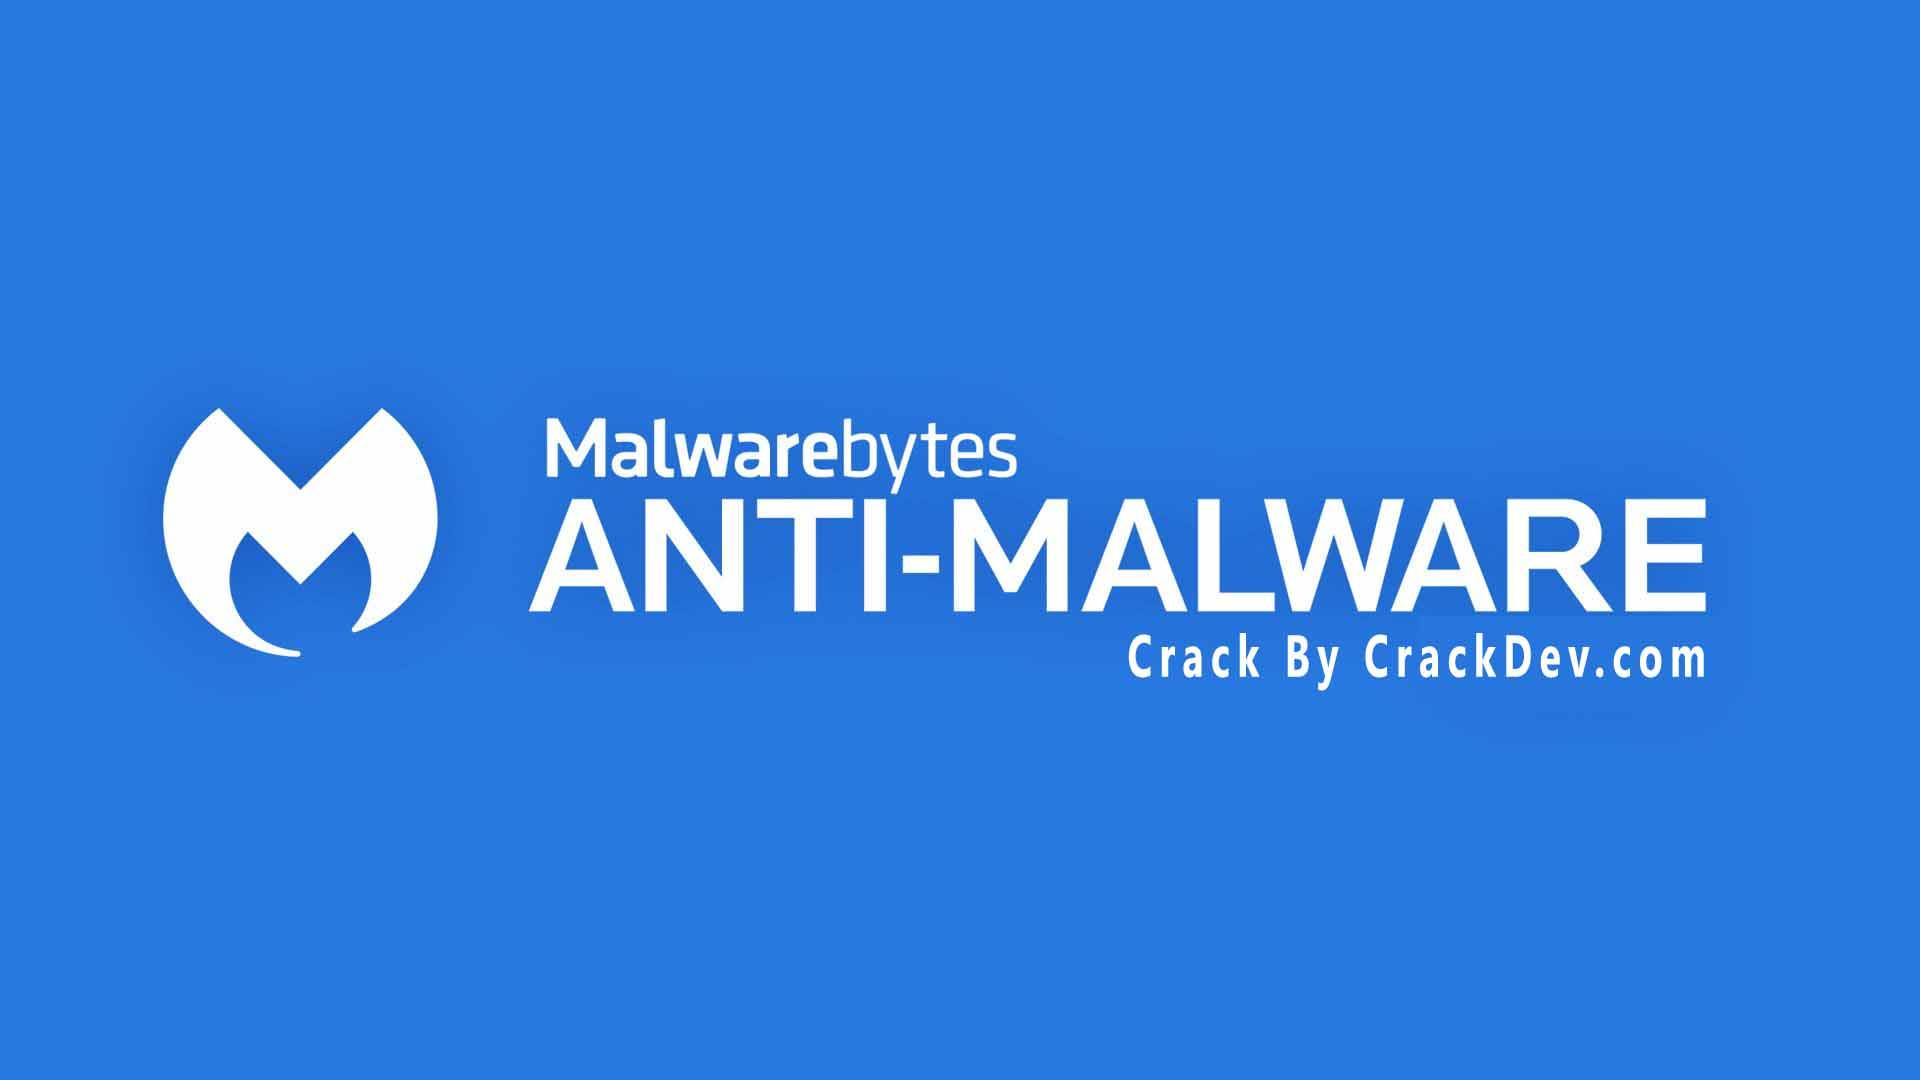 Malwarebytes Crack 2021